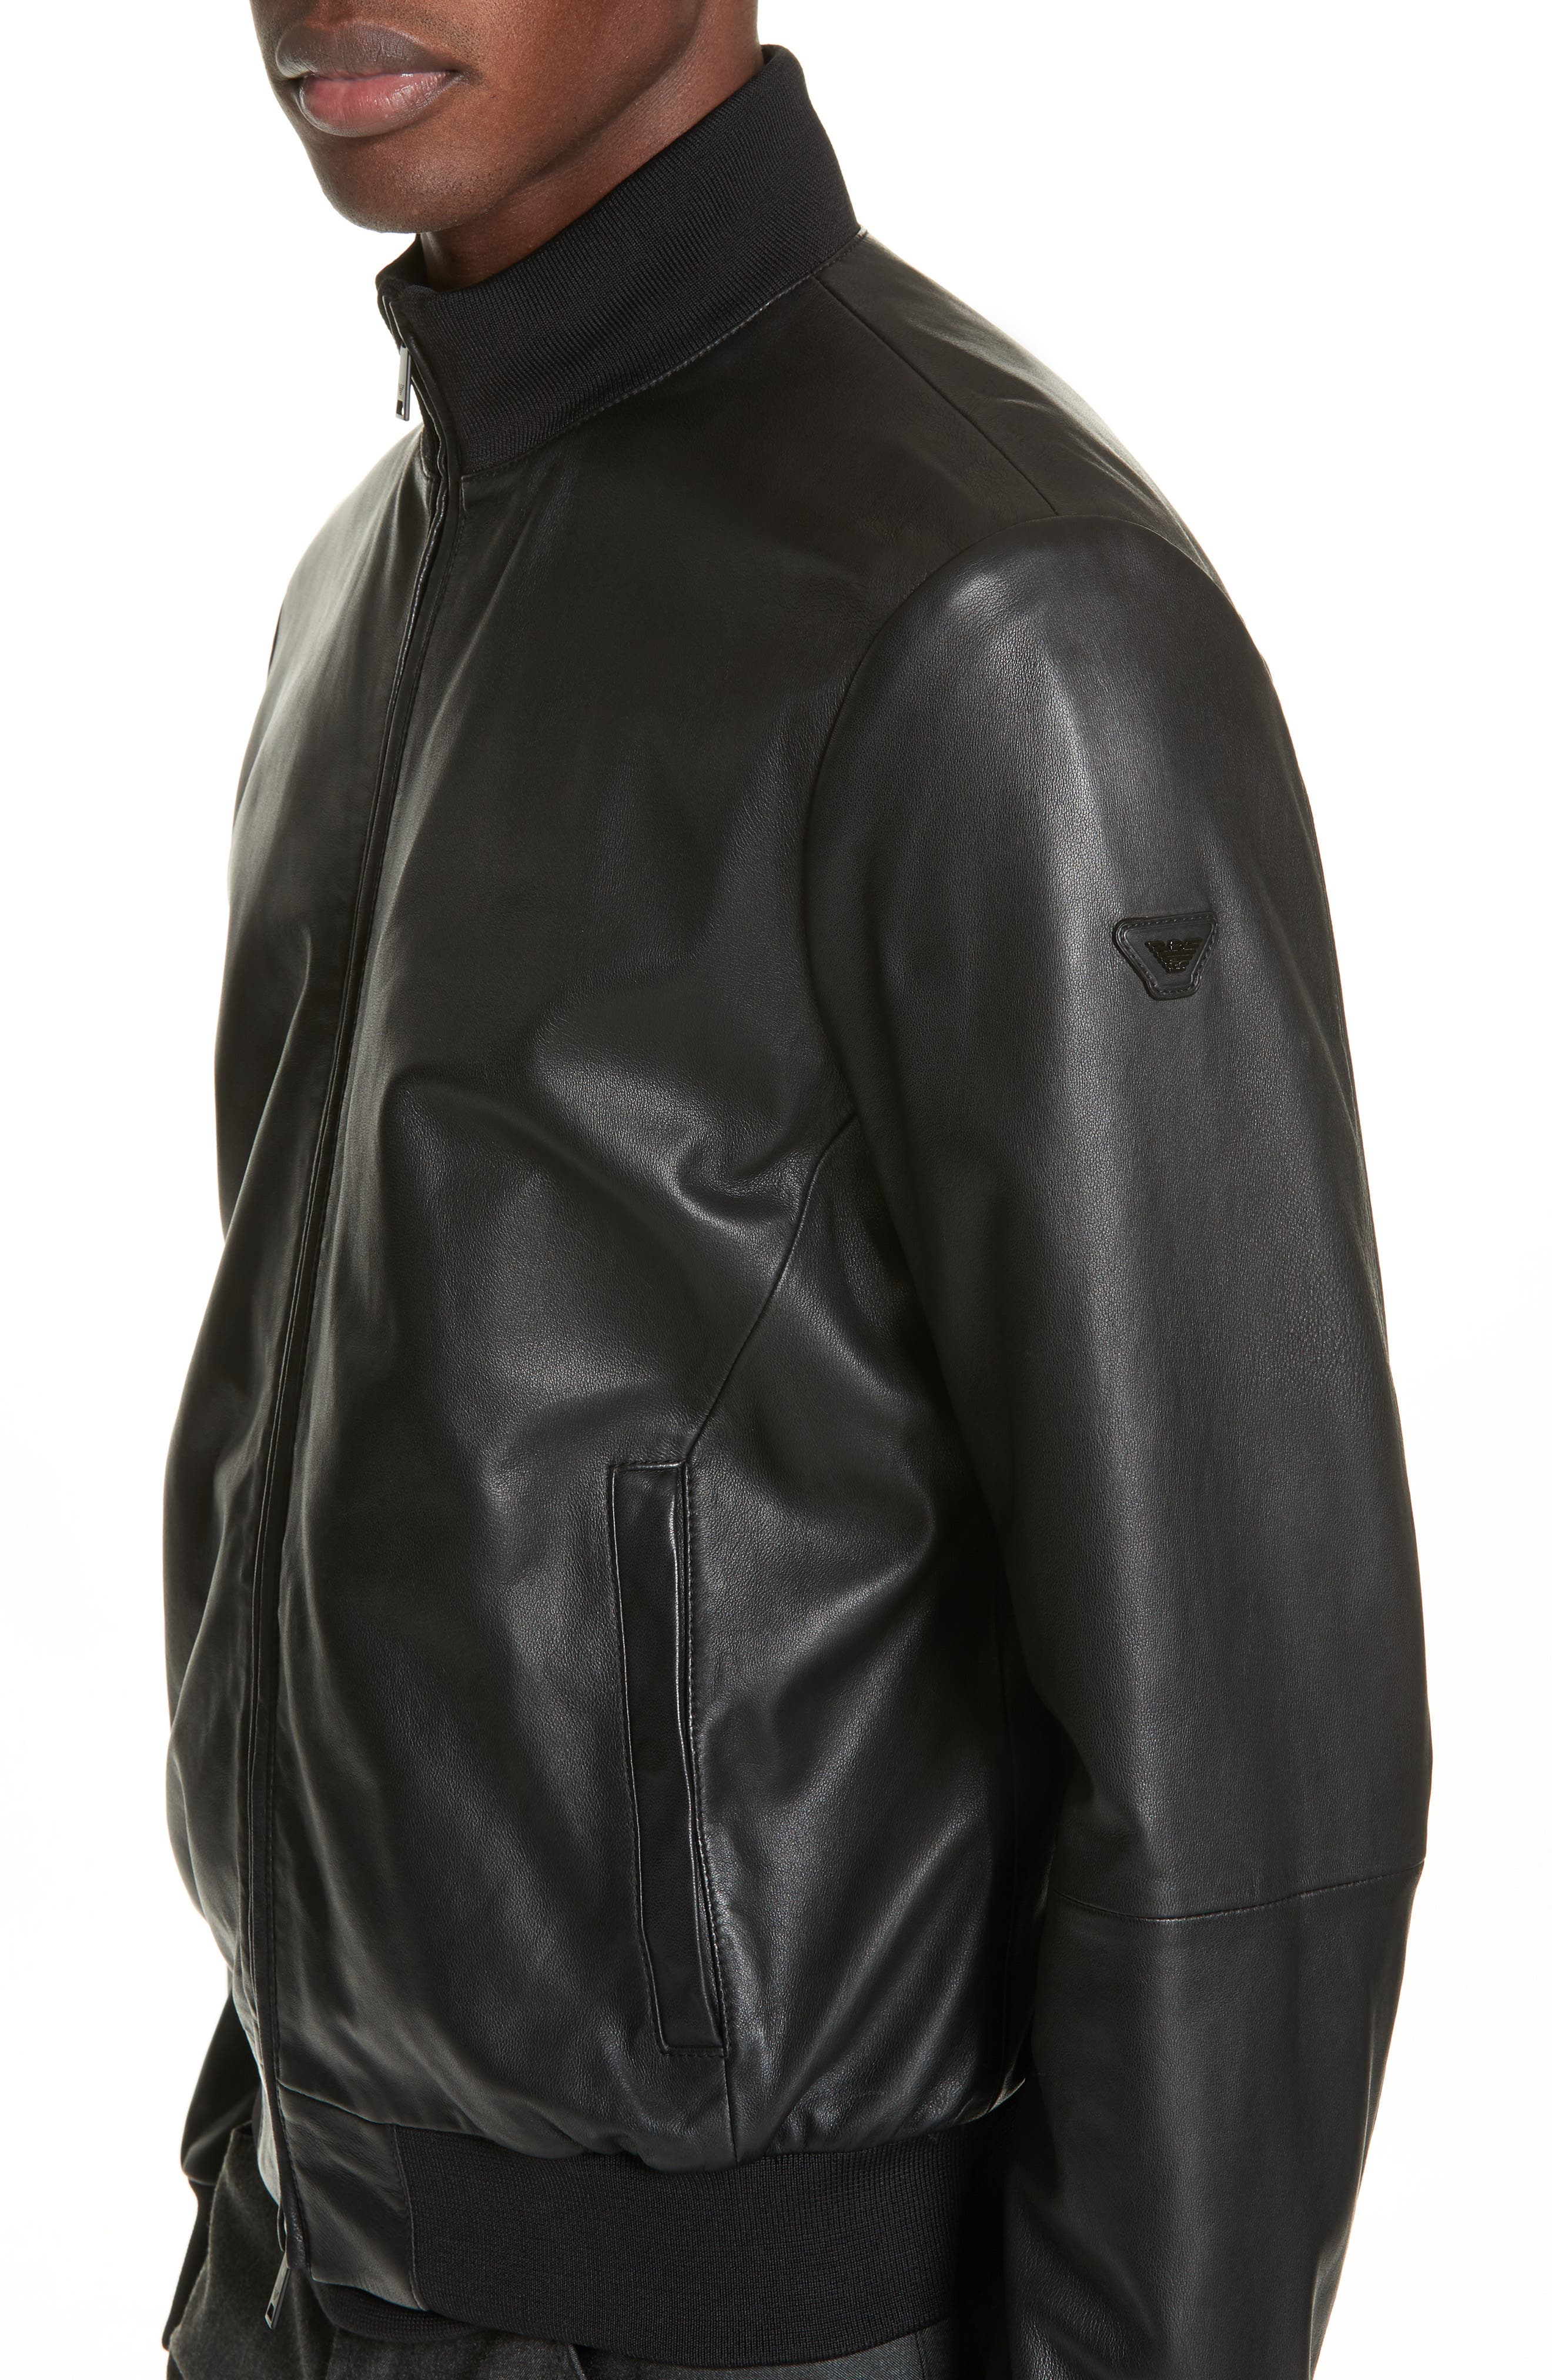 EMPORIO ARMANI, Leather Bomber Jacket, Alternate thumbnail 5, color, BLACK